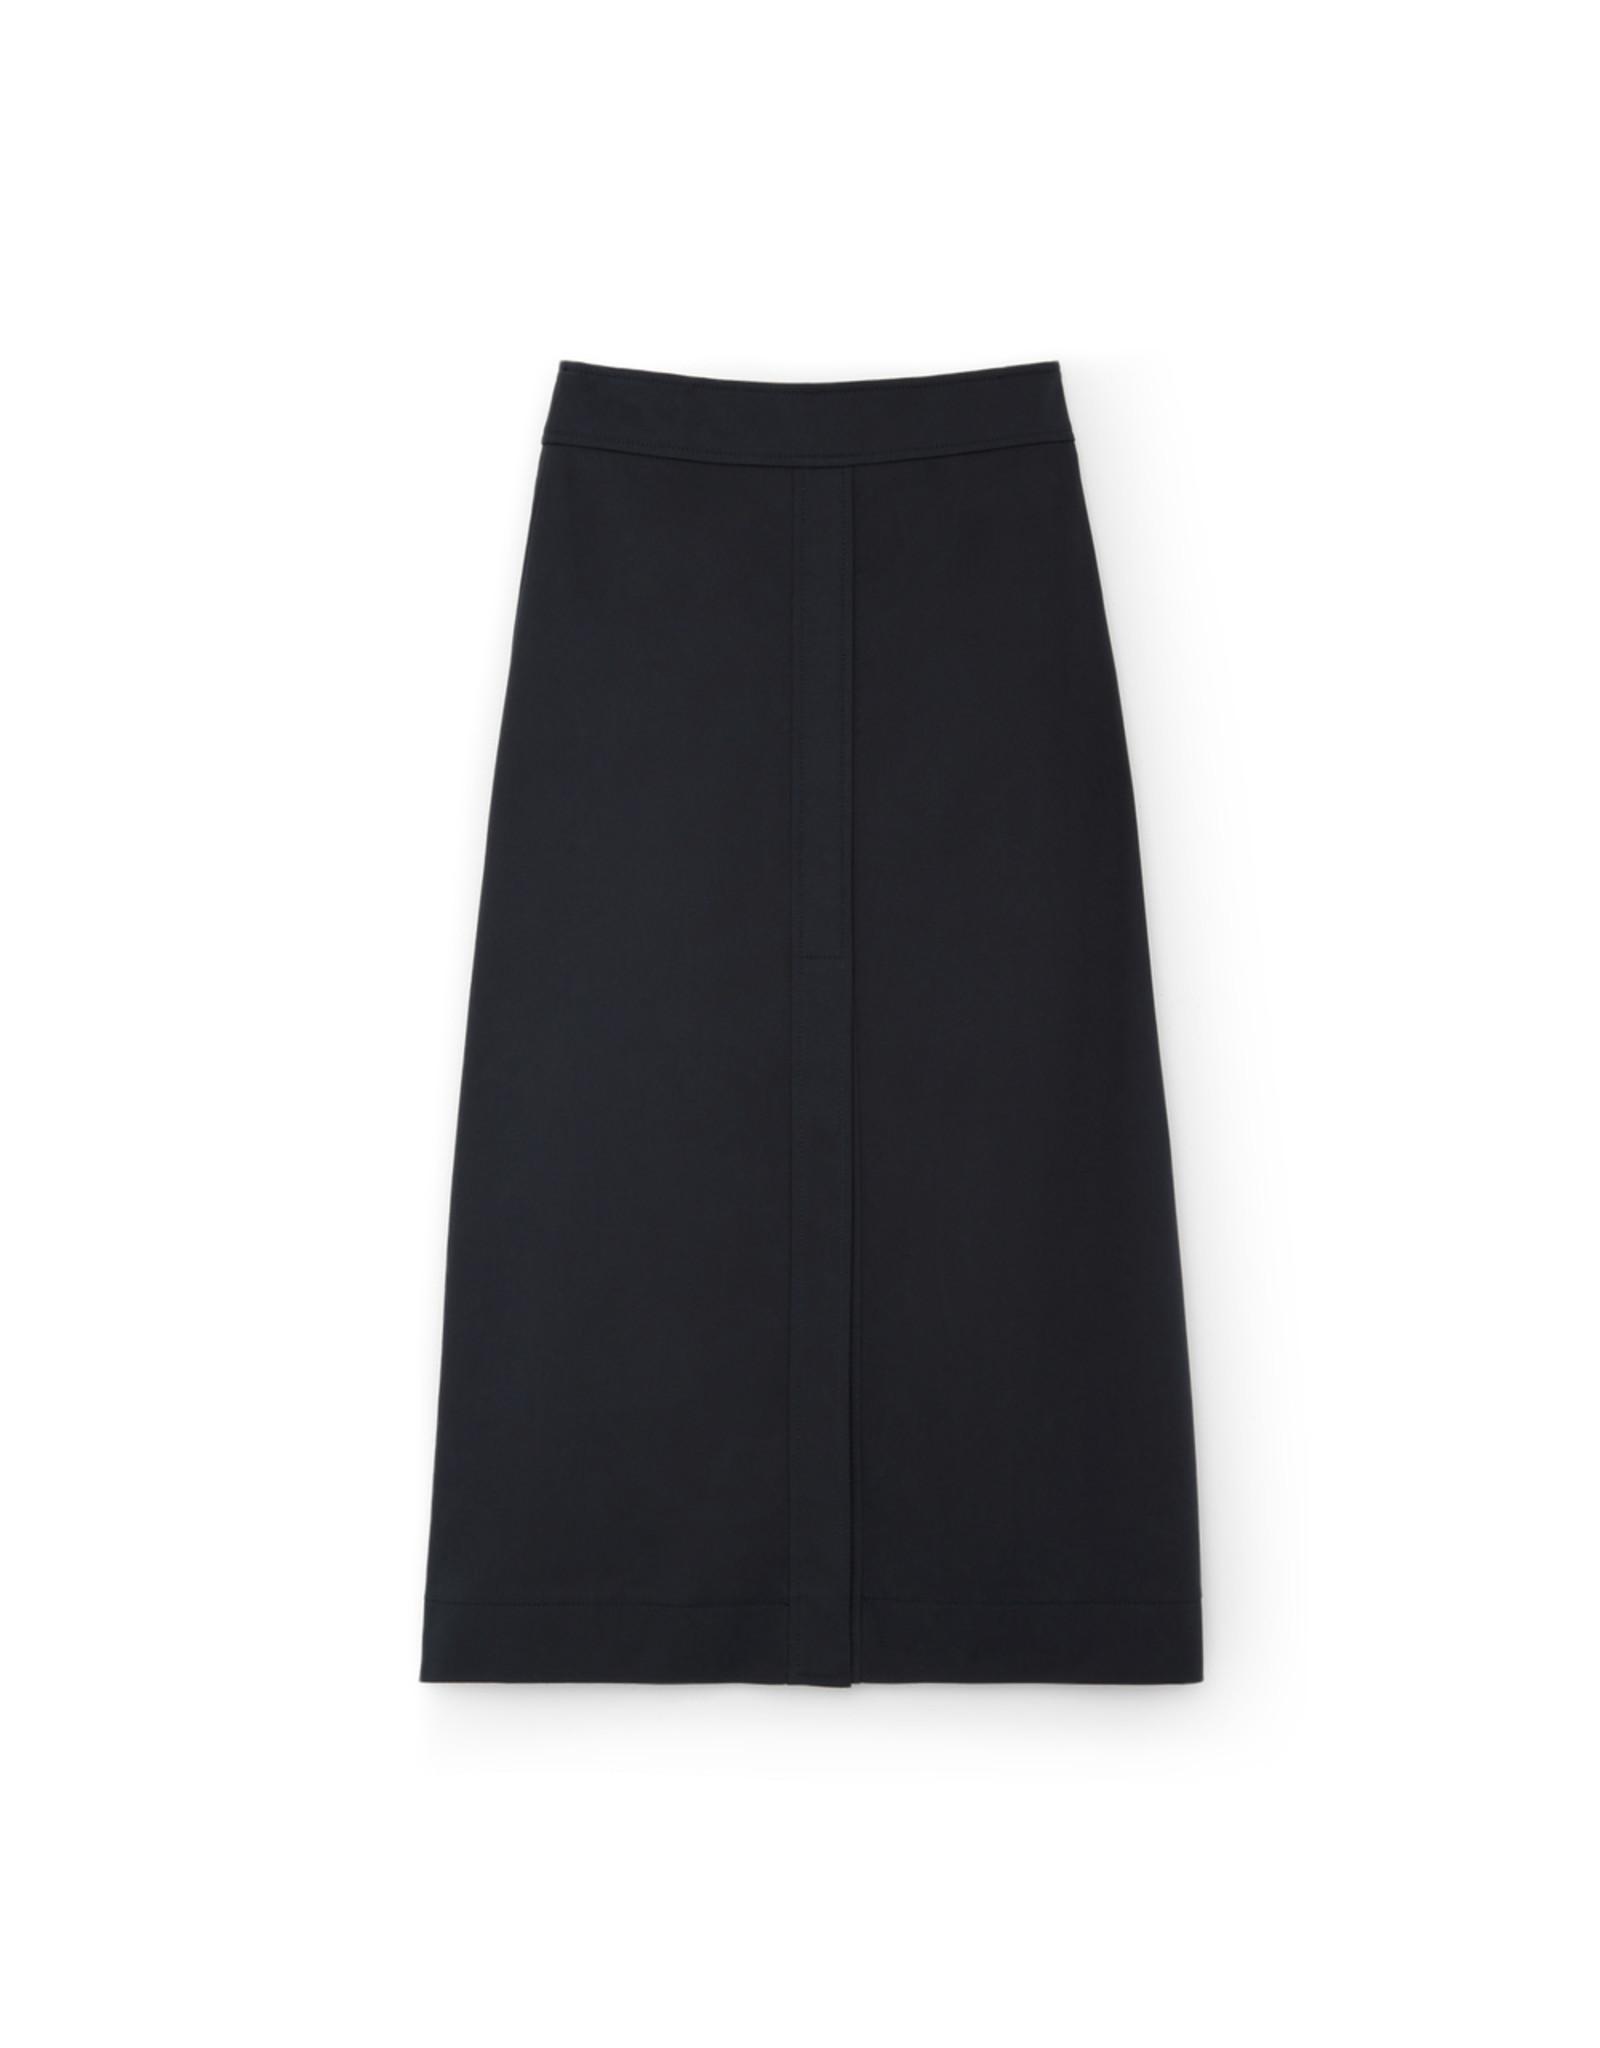 G. Label G. Label Stewart A-Line Cotton Skirt (Color: Navy, Size: 6)